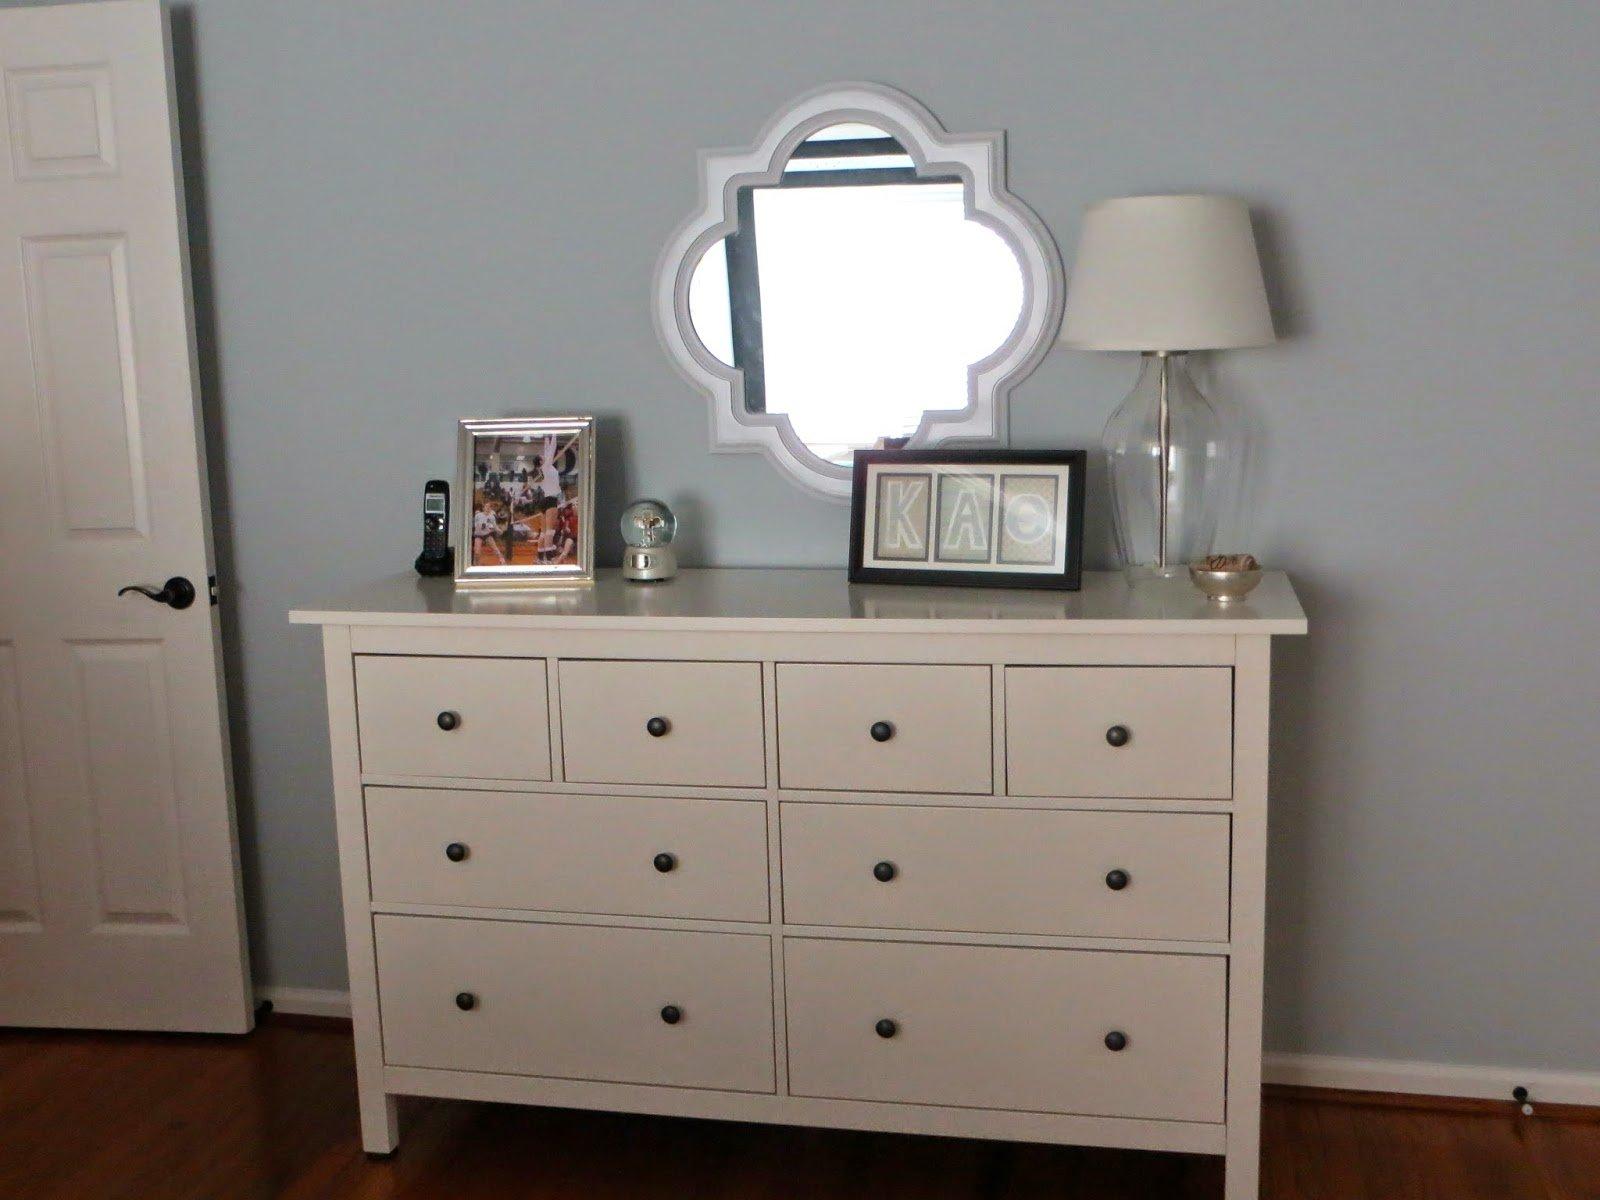 Ikea Hemnes 3 Drawer Dresser Home Furniture Design